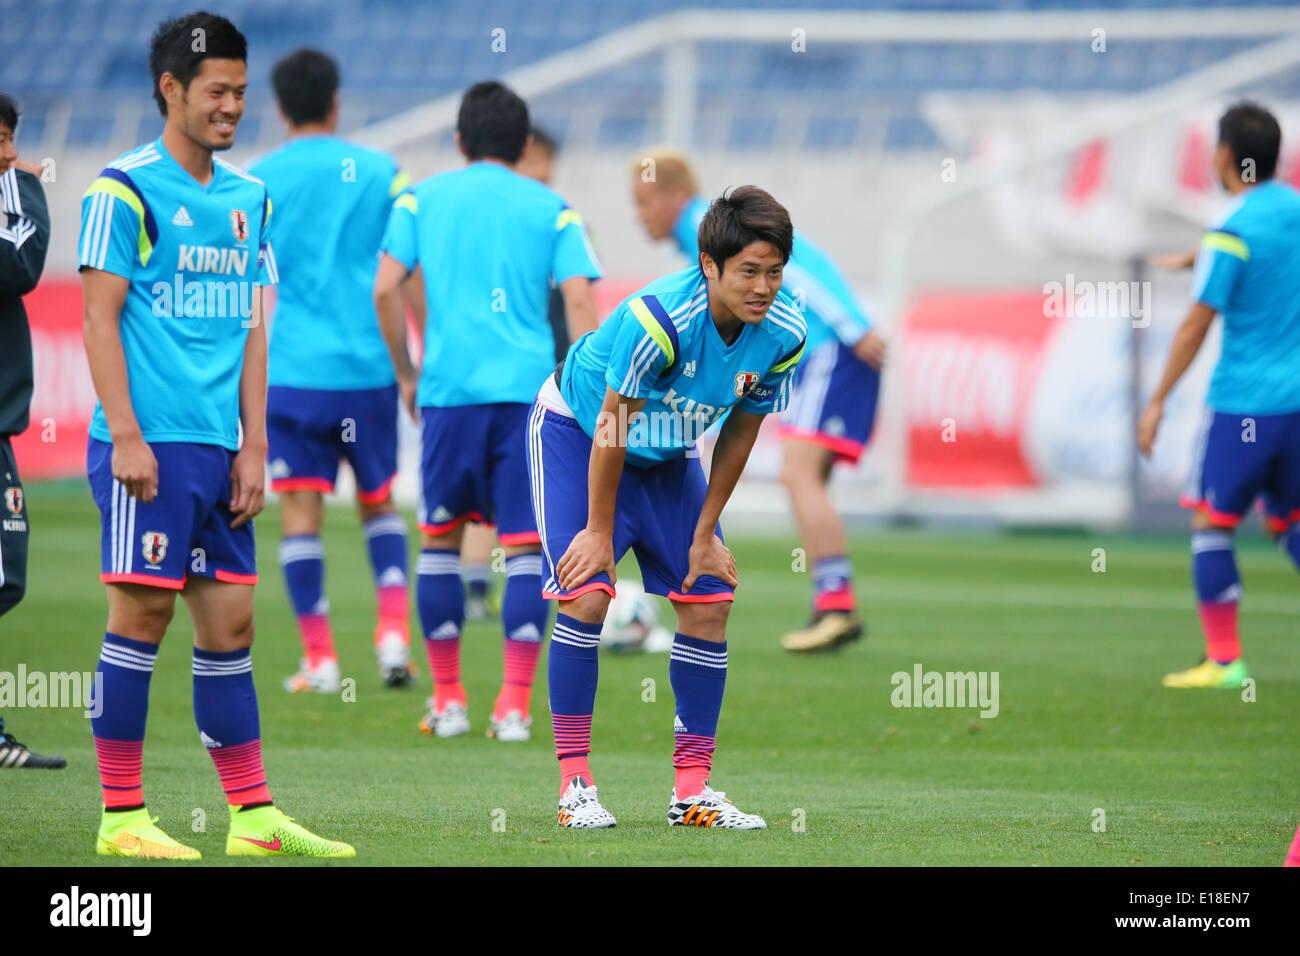 Japan Team Group Line Up Jpn May Imágenes De Stock   Japan Team ... 30fc1a5057d7c